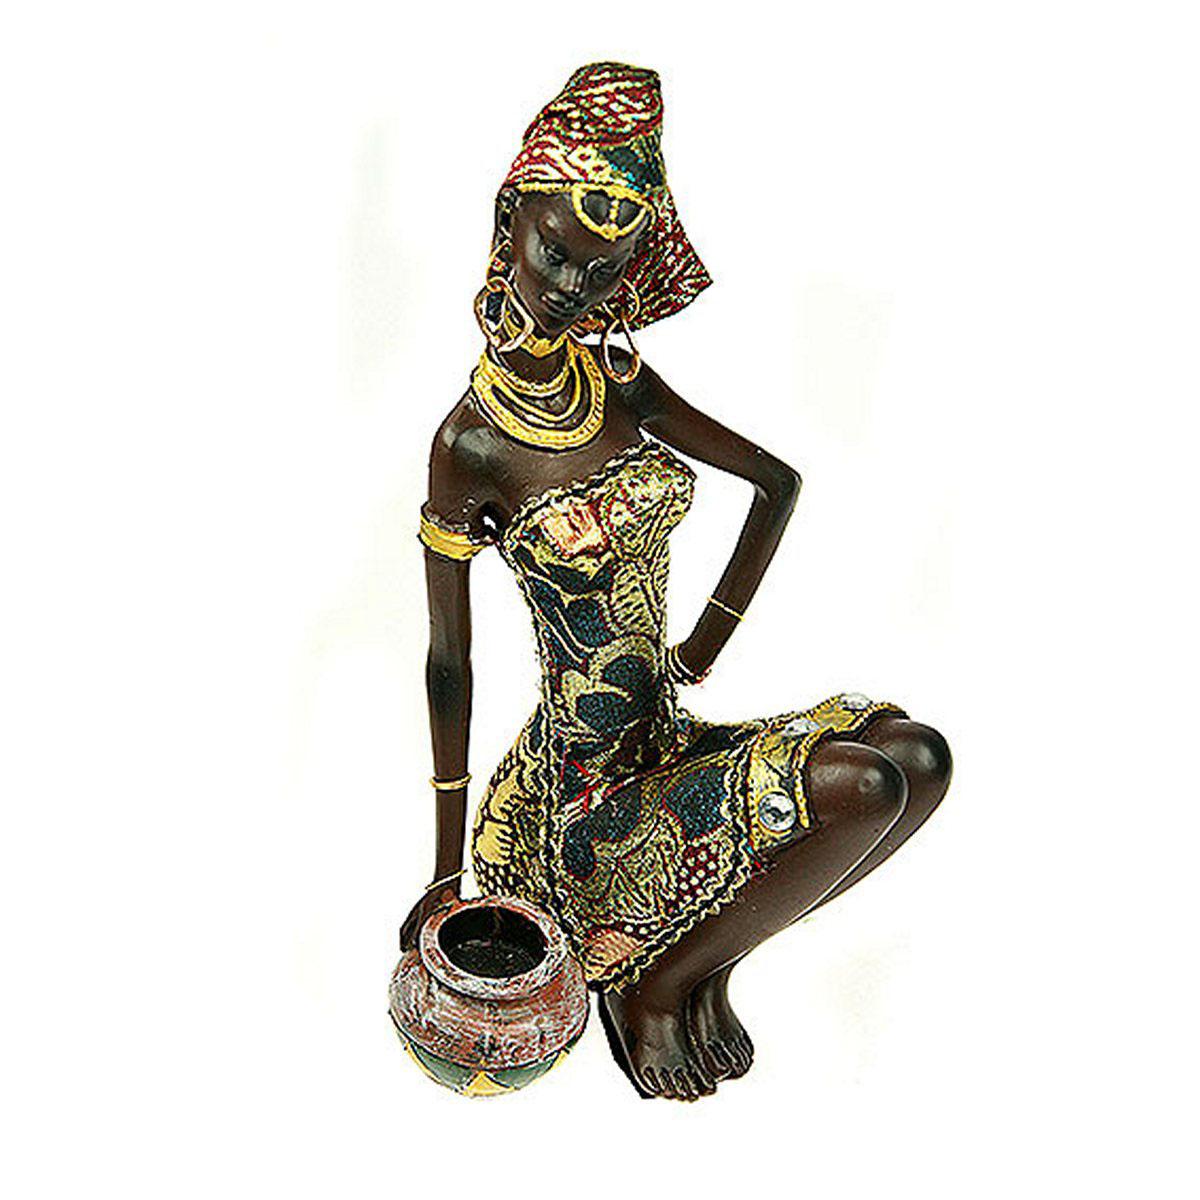 Статуэтка Русские Подарки Африканка, 14 х 13 х 23 см26147